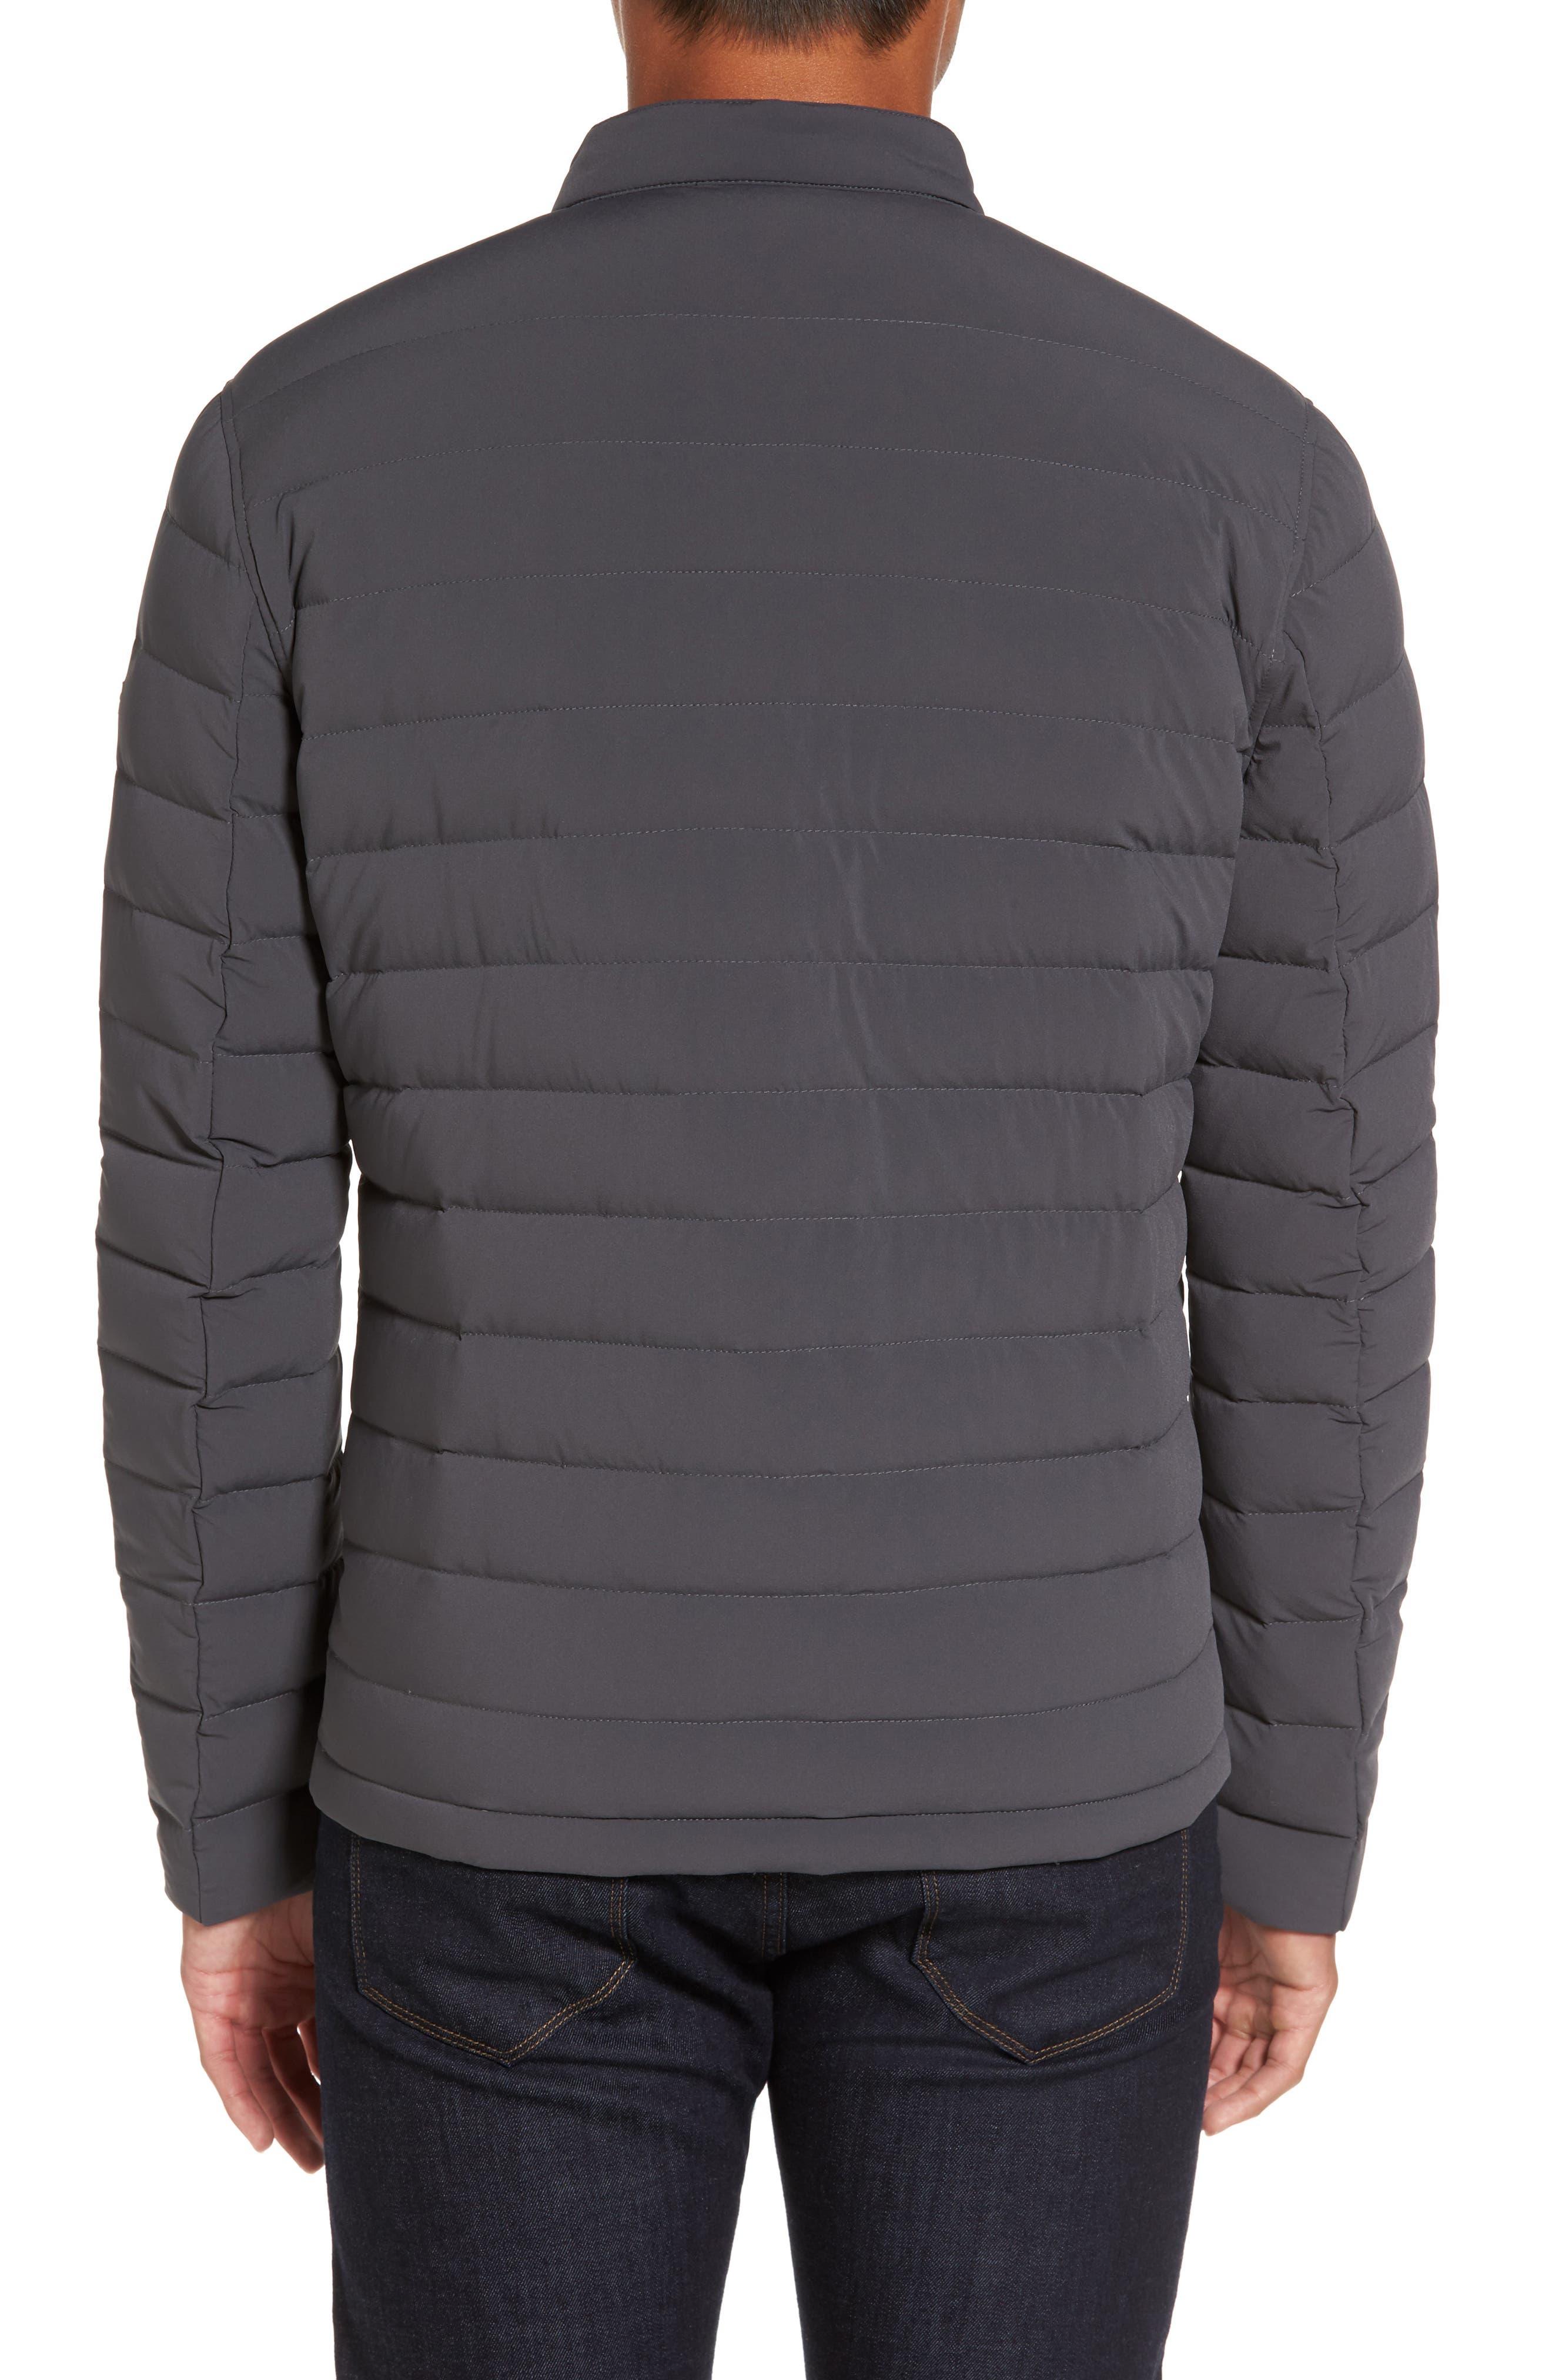 Alternate Image 2  - Michael Kors Packable Stretch Down Jacket